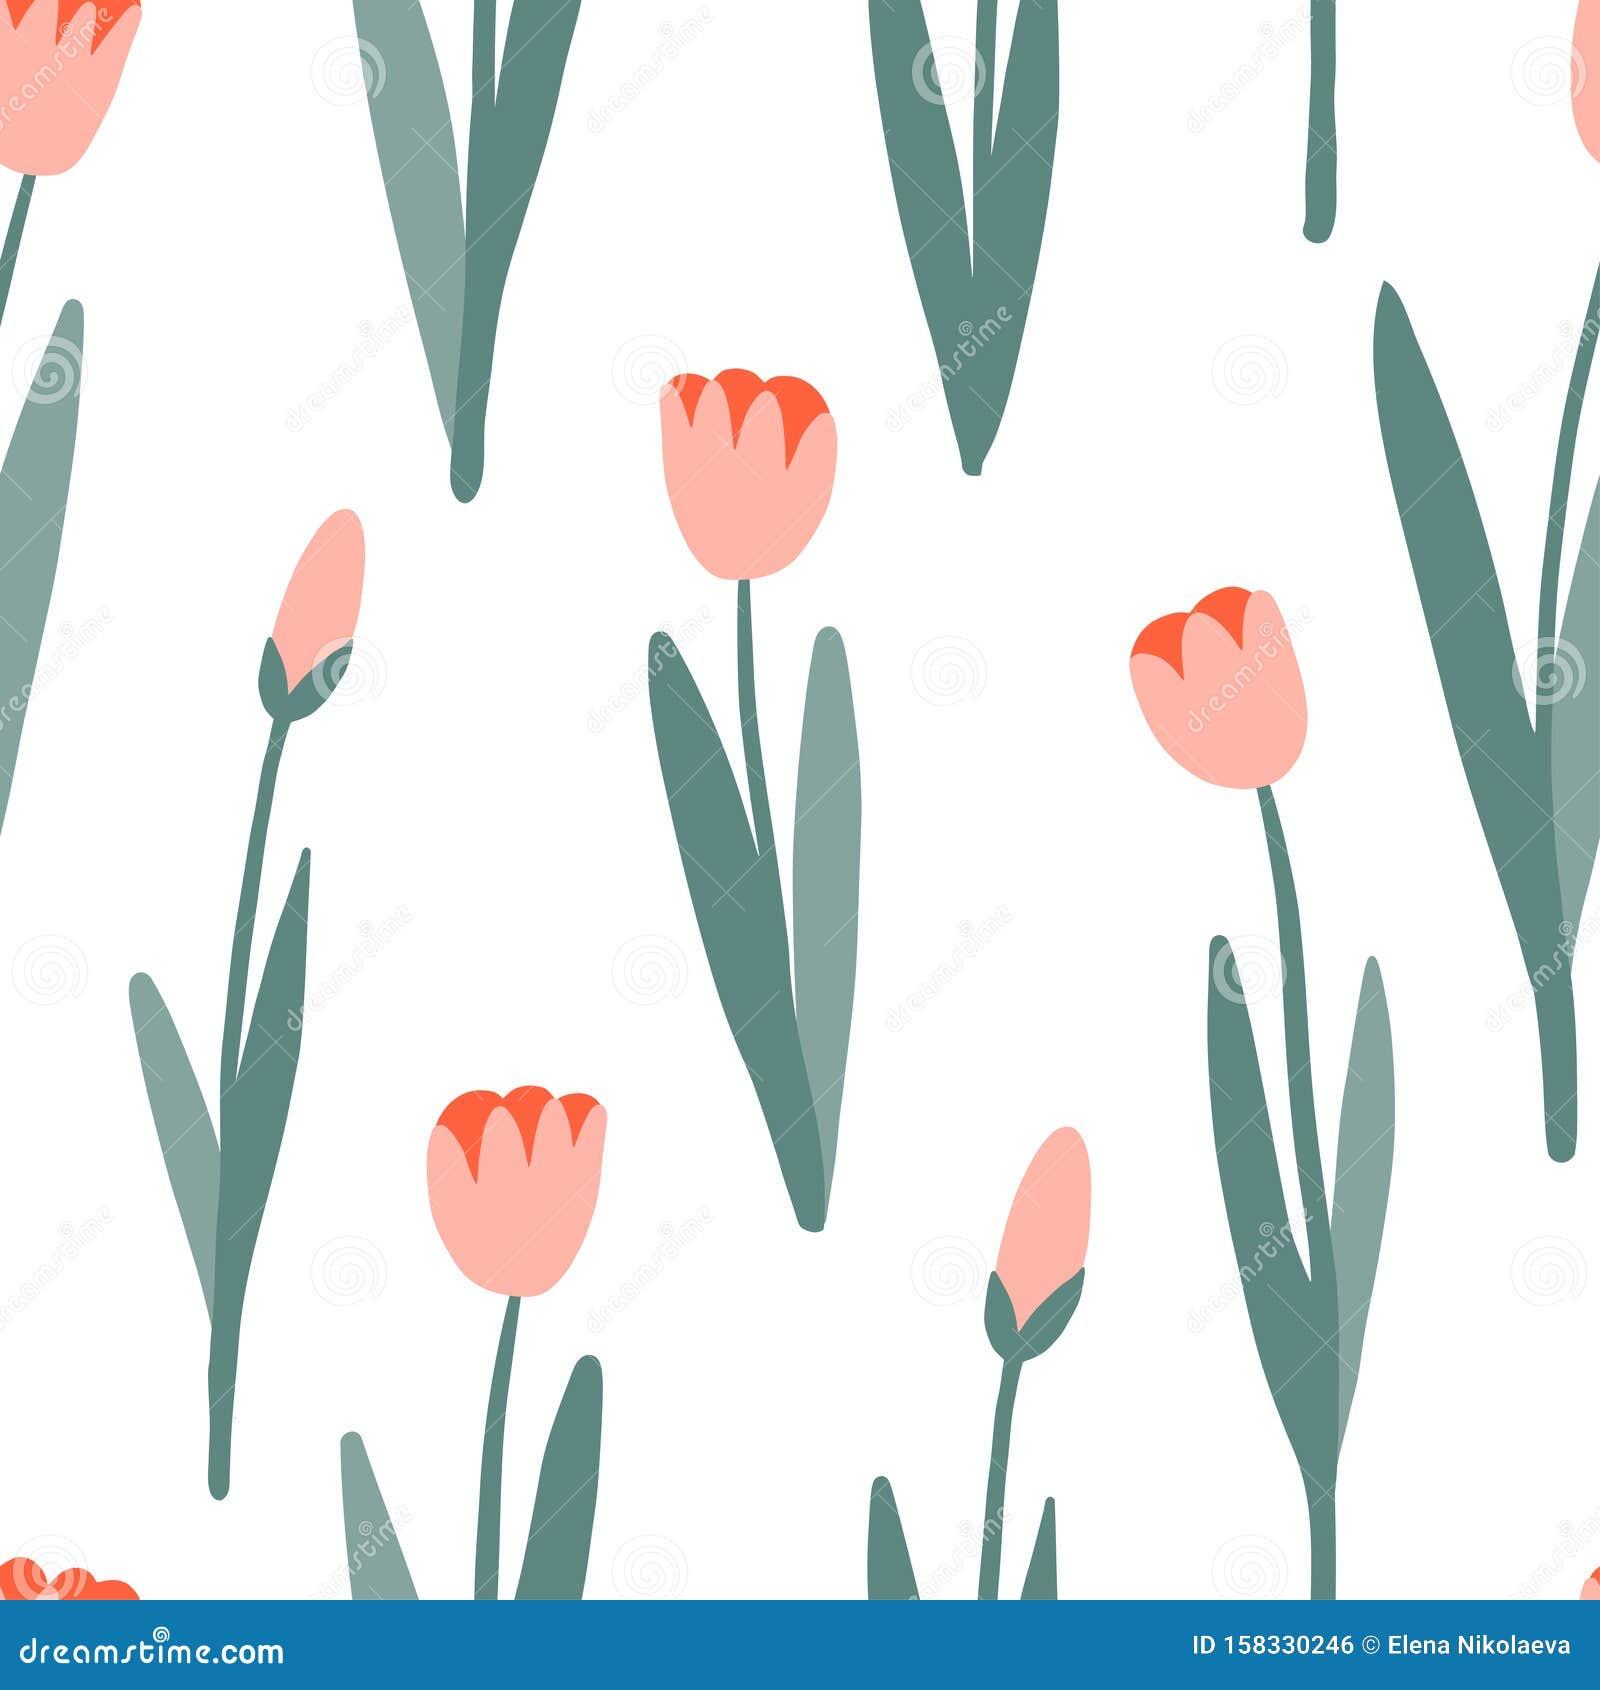 Flower Simple Seamless Pattern Spring Or Summer Graphic Design Stock Vector Illustration Of Decoration Design 158330246,Royal Blue Wedding Cupcake Designs